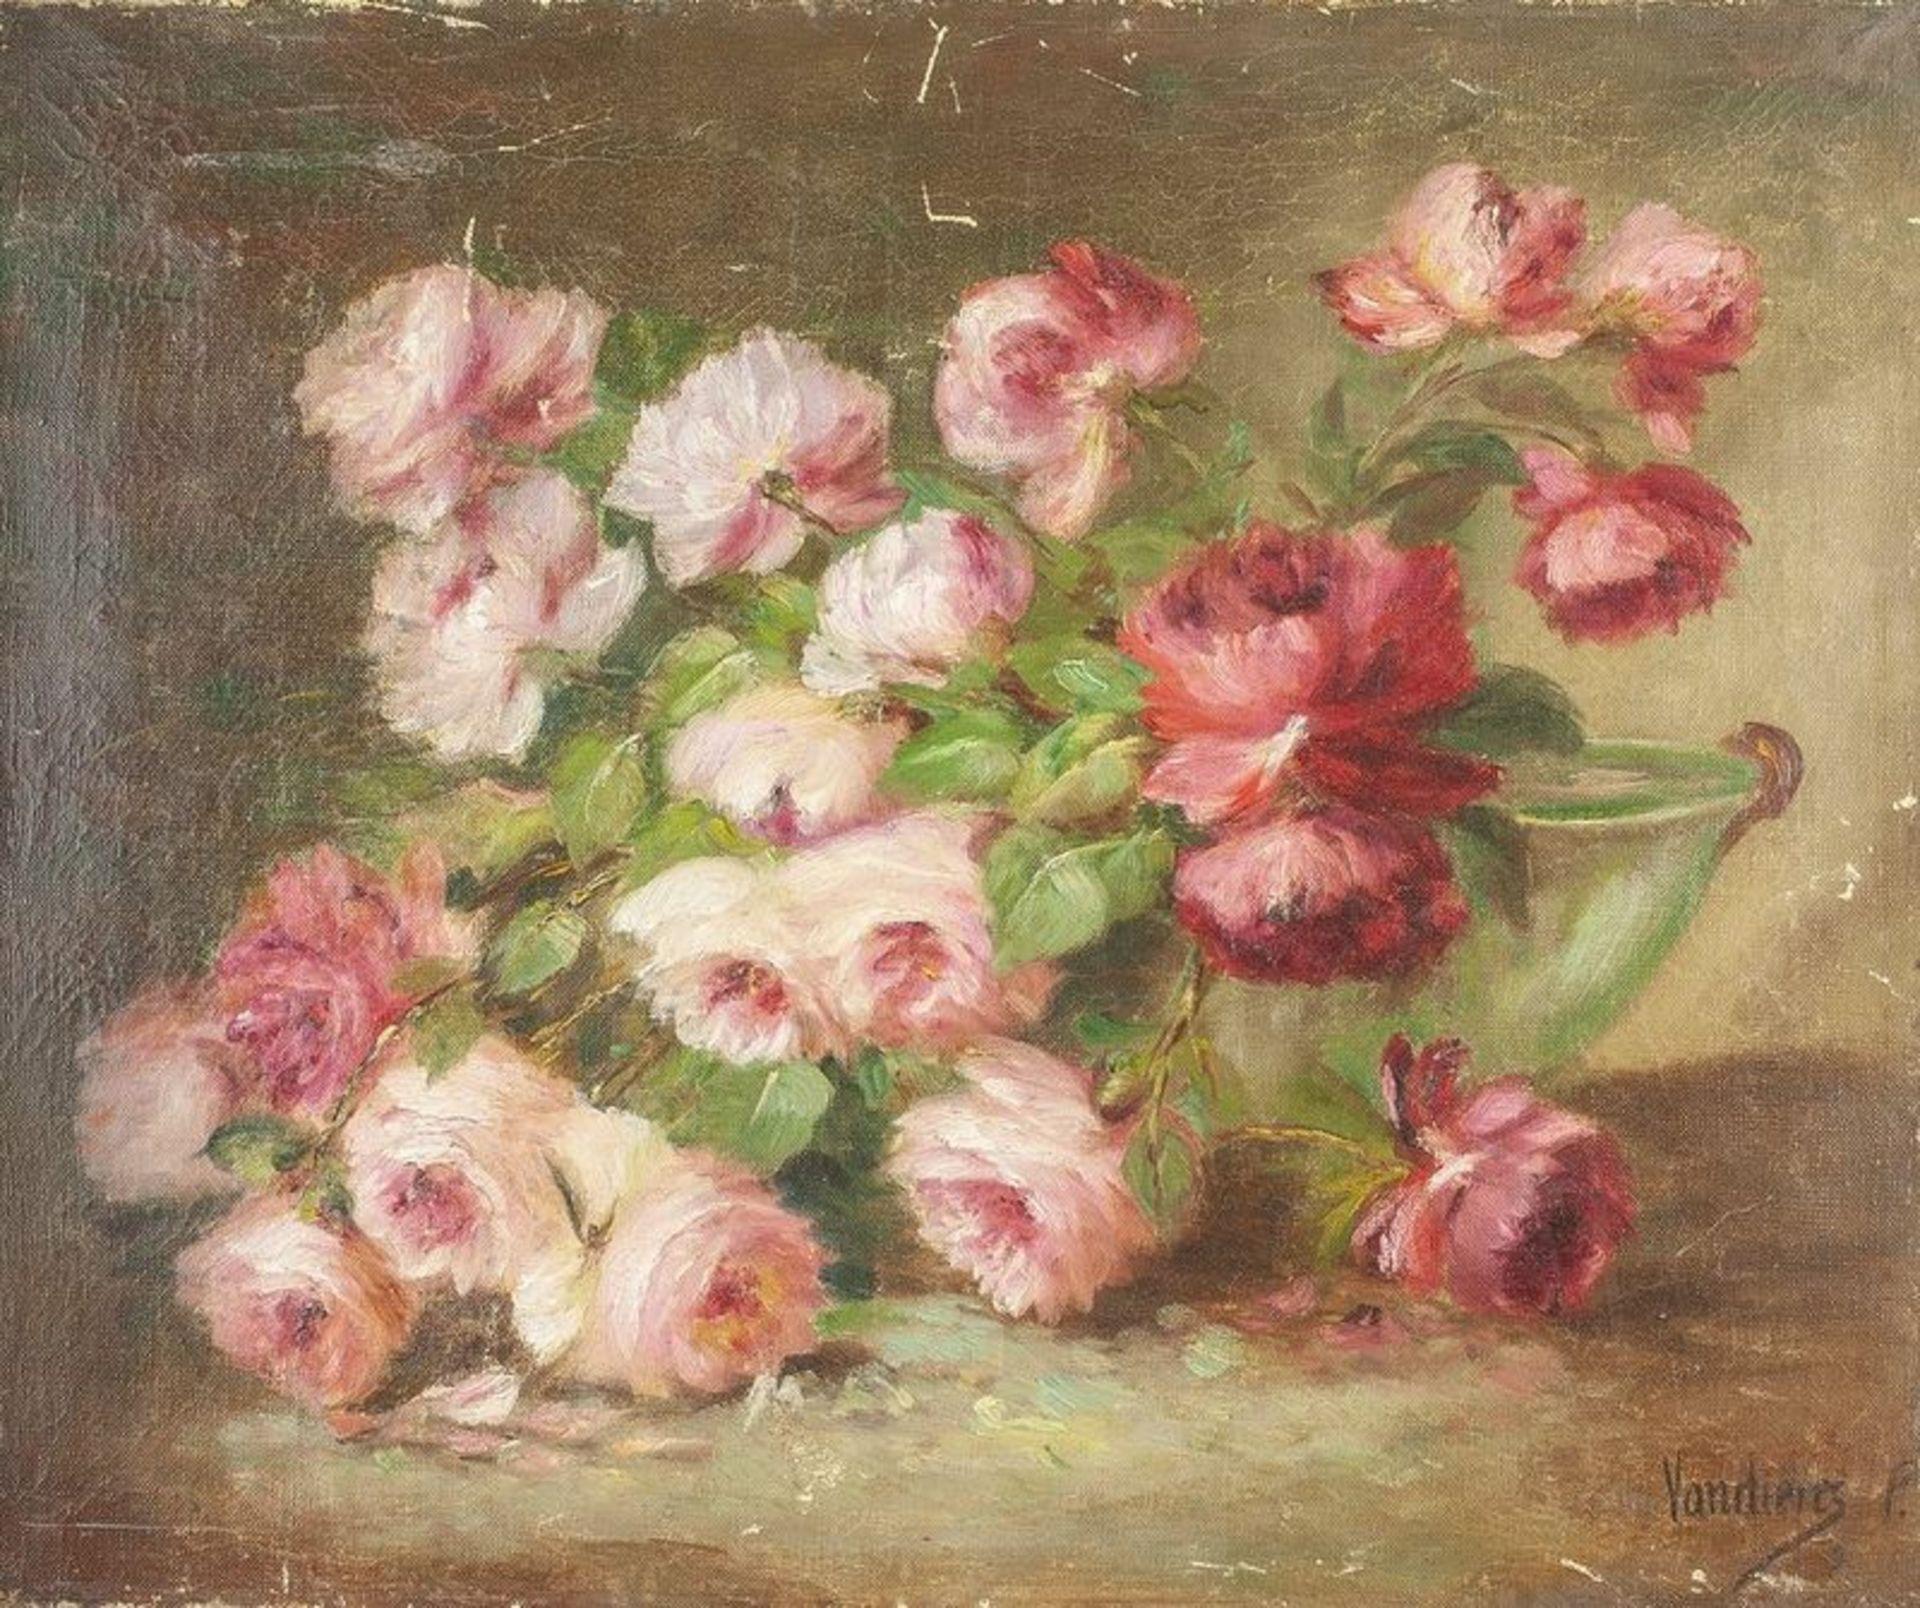 Los 607 - P. VANDERIES Peonies - Signed 'Vandieres P.' (lower right) Oil on canvas 46 x [...]